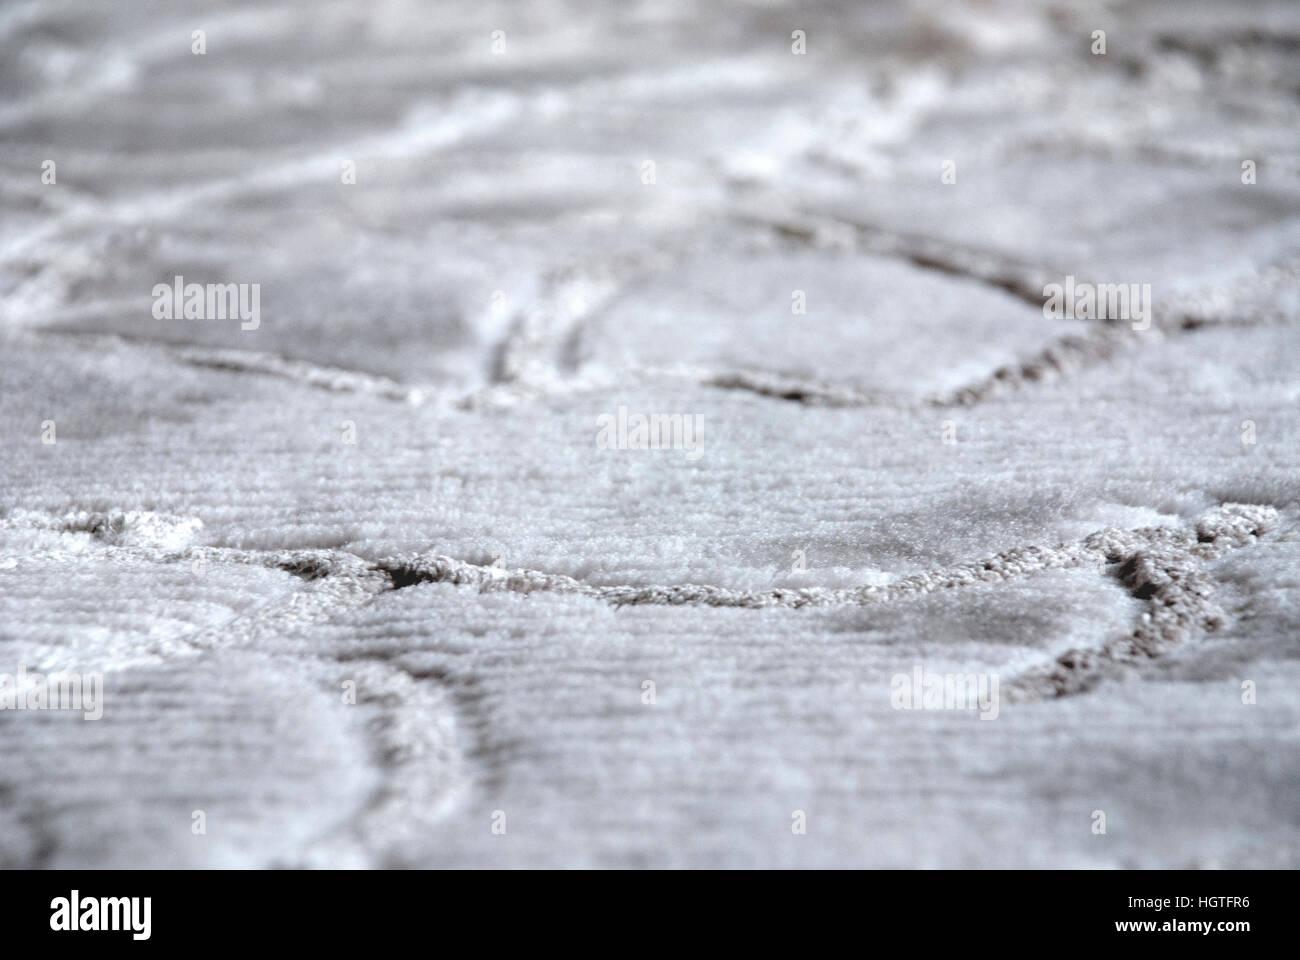 Graue Textur Hintergründe Stockbild